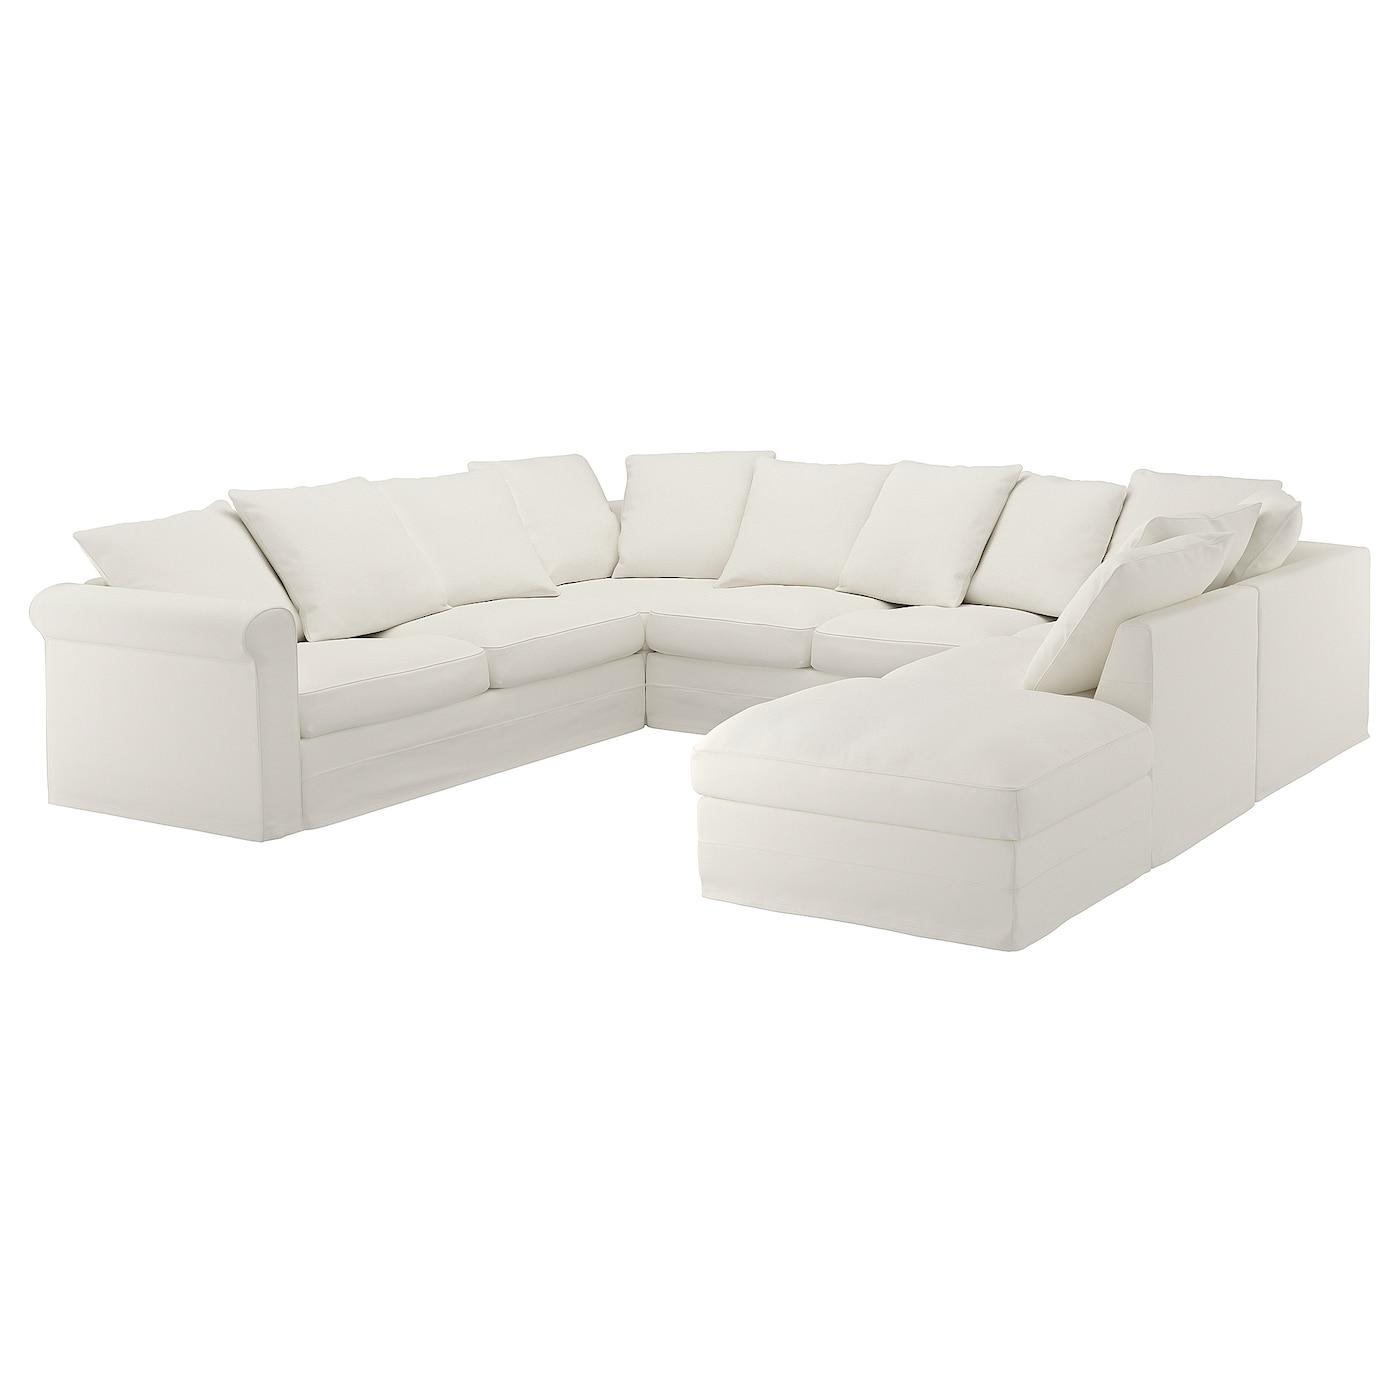 Ikea GrÖnlid Cover For U Shaped Sofa 6 Seat